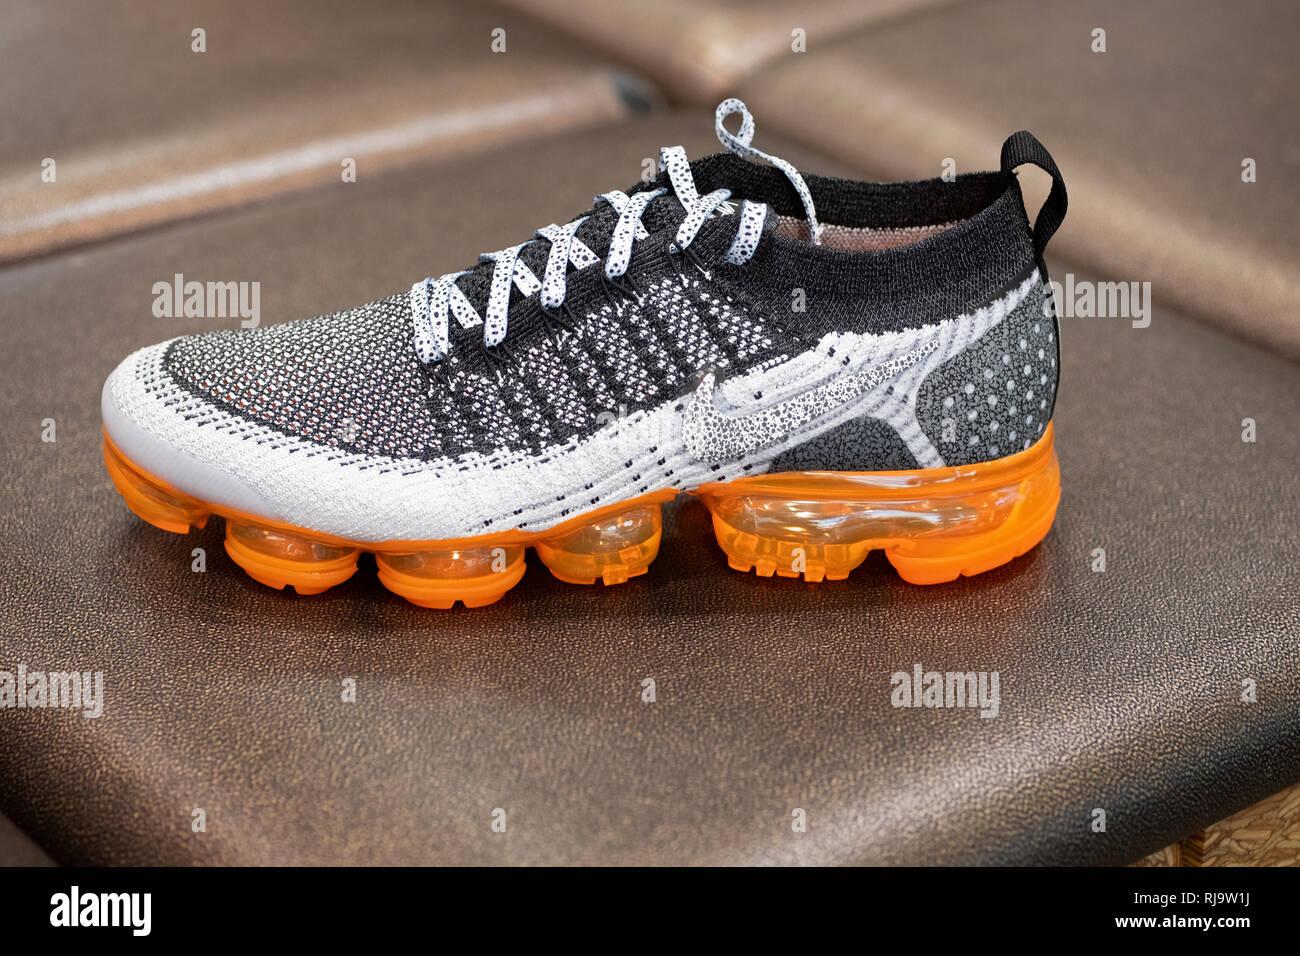 Nike Laufschuh Stockfotos & Nike Laufschuh Bilder Alamy